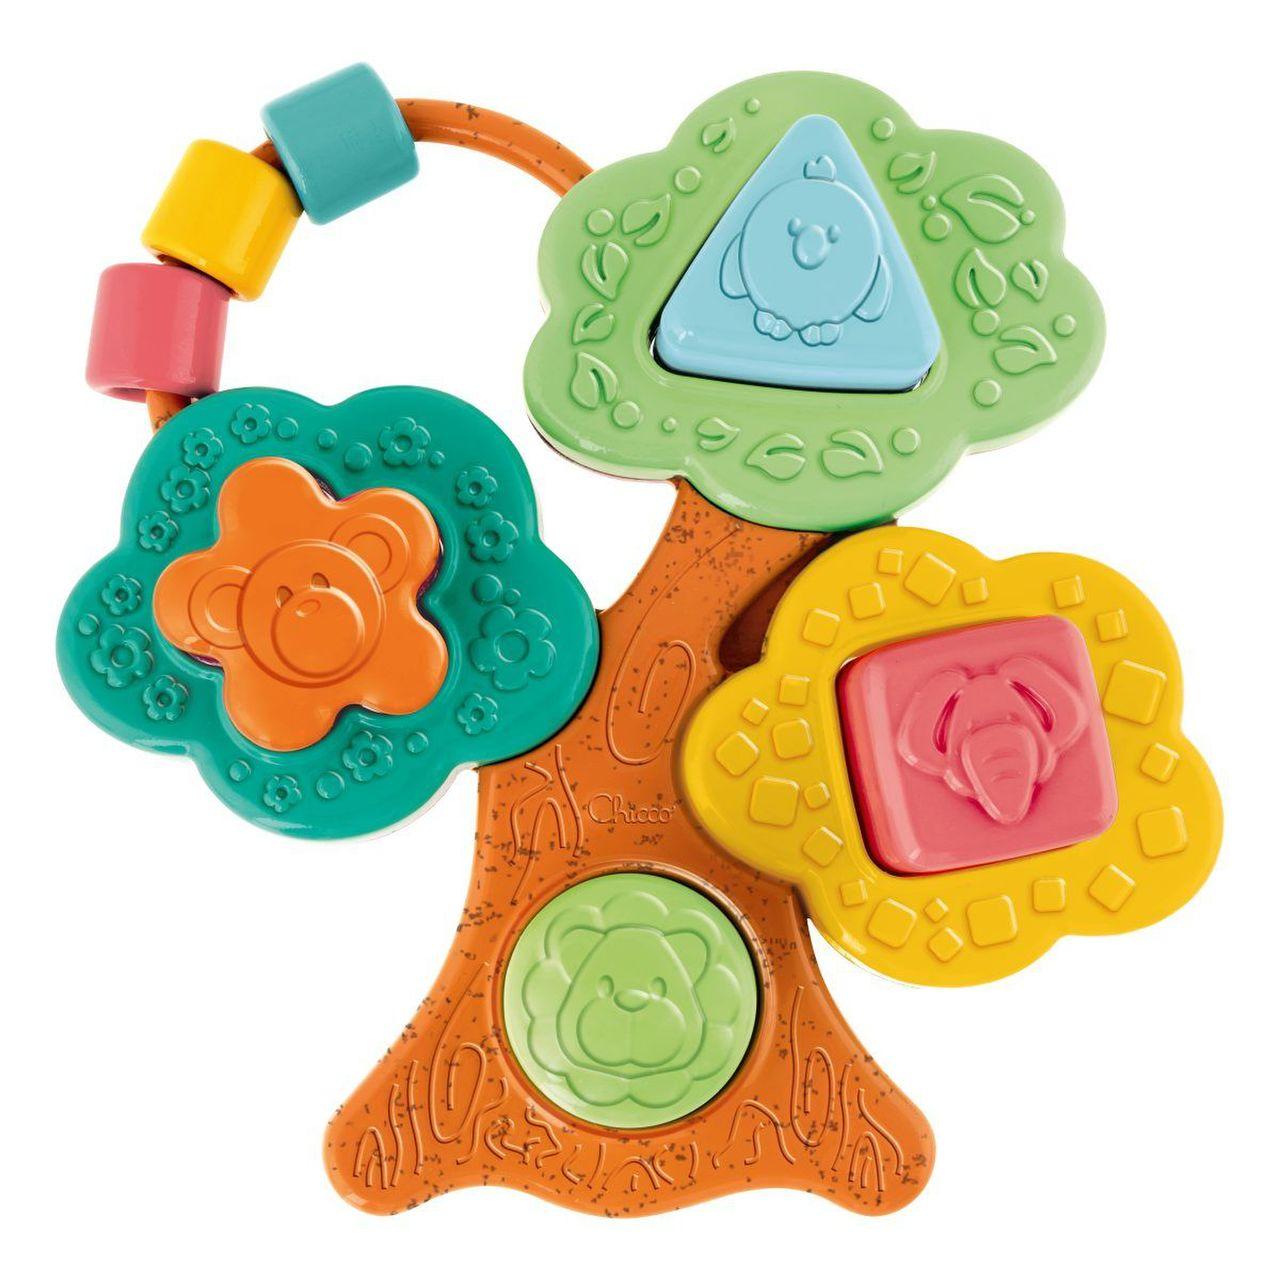 Chicco ECO+ Σειρά Το Δέντρο της Ζωής με Σχήματα Y02-10493-00